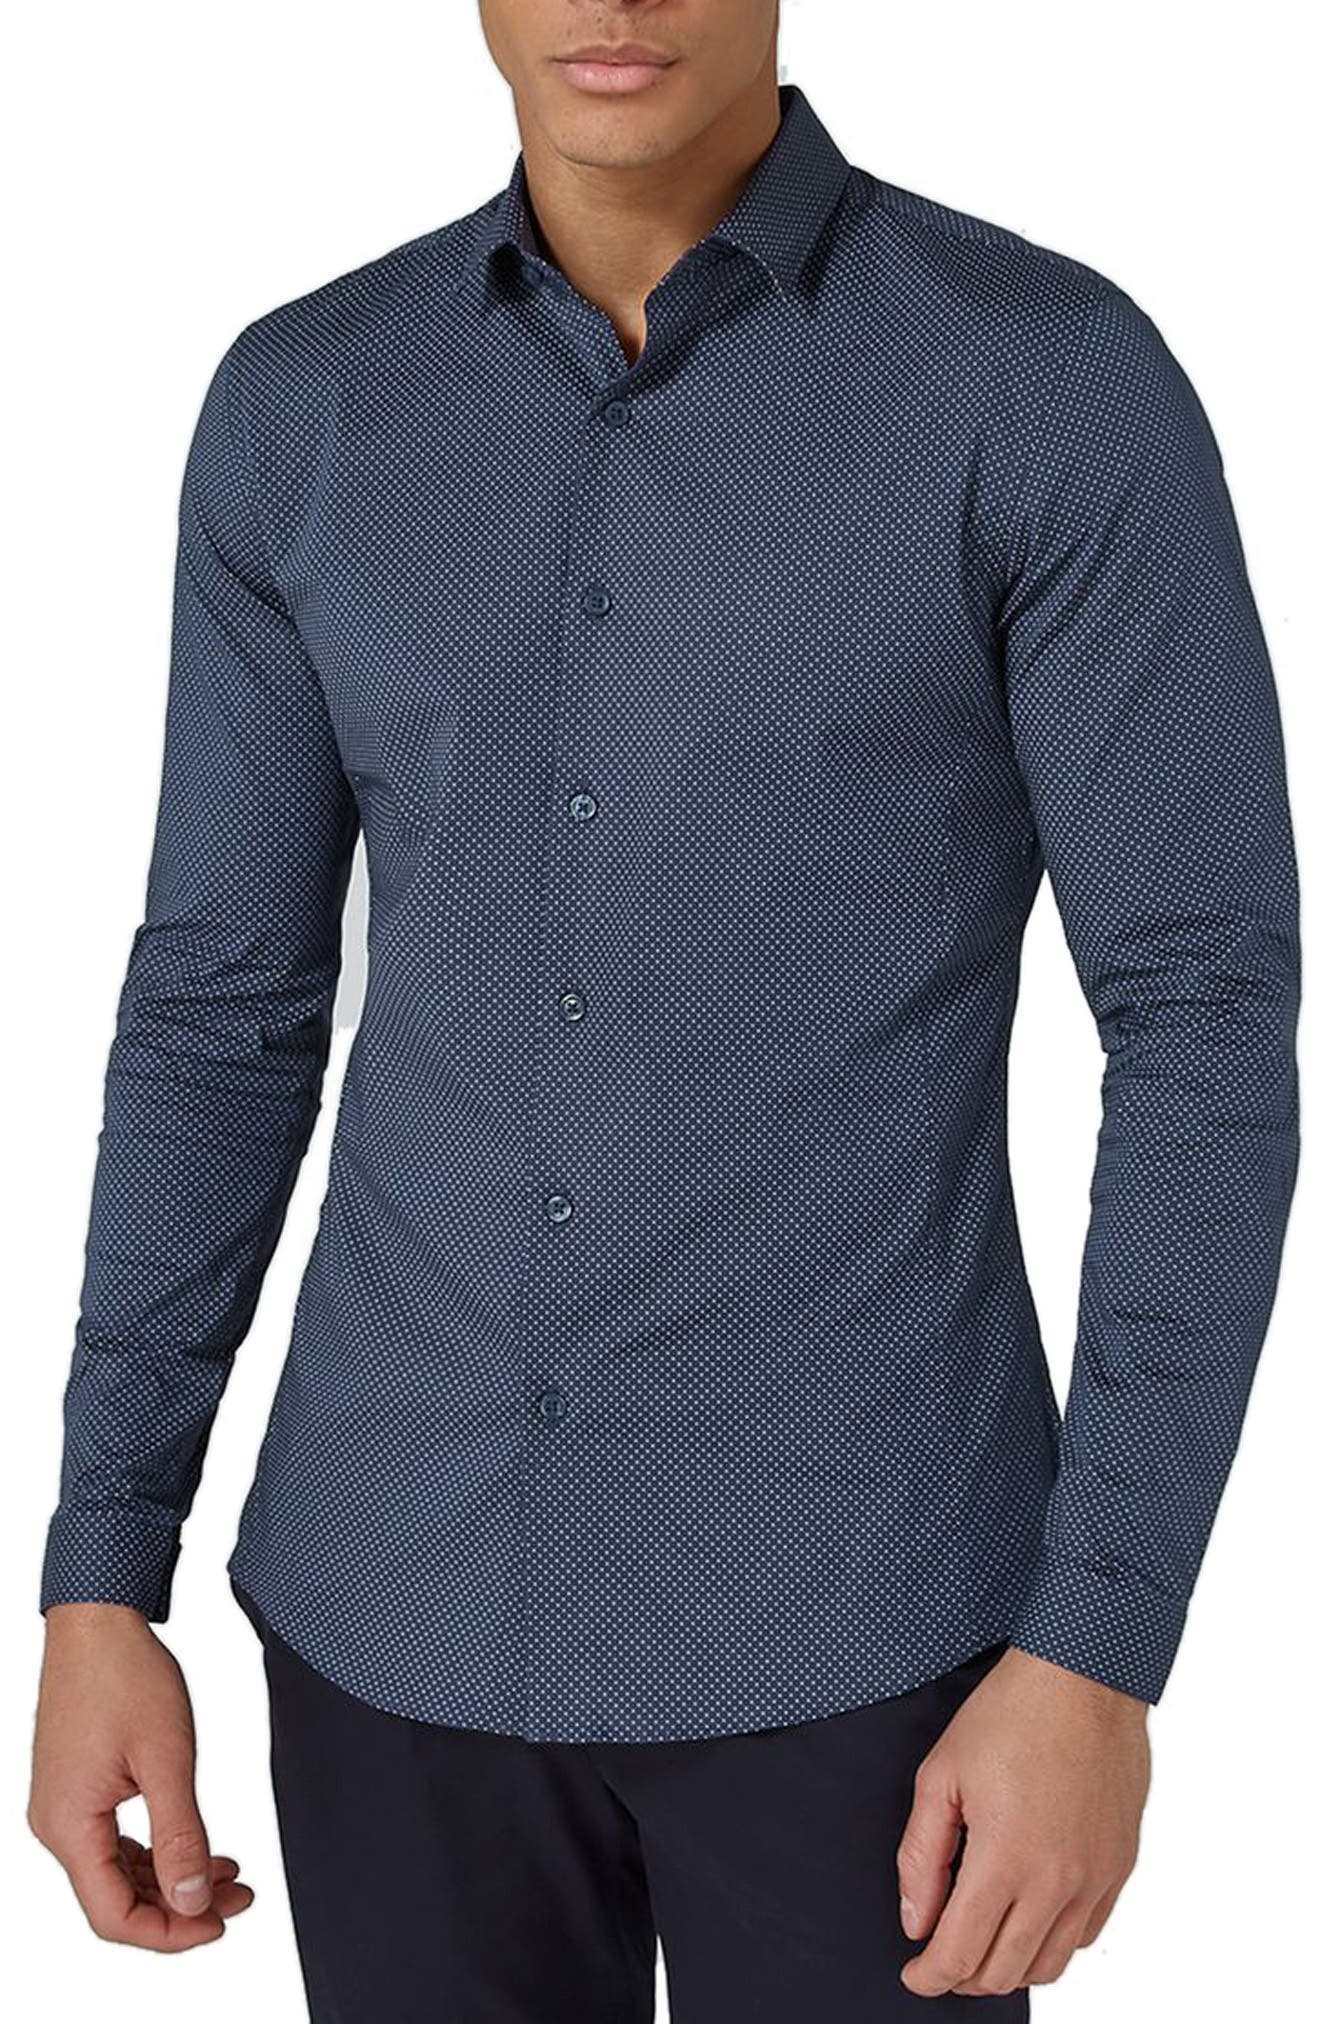 Main Image - Topman Polka Dot Stretch Smart Shirt